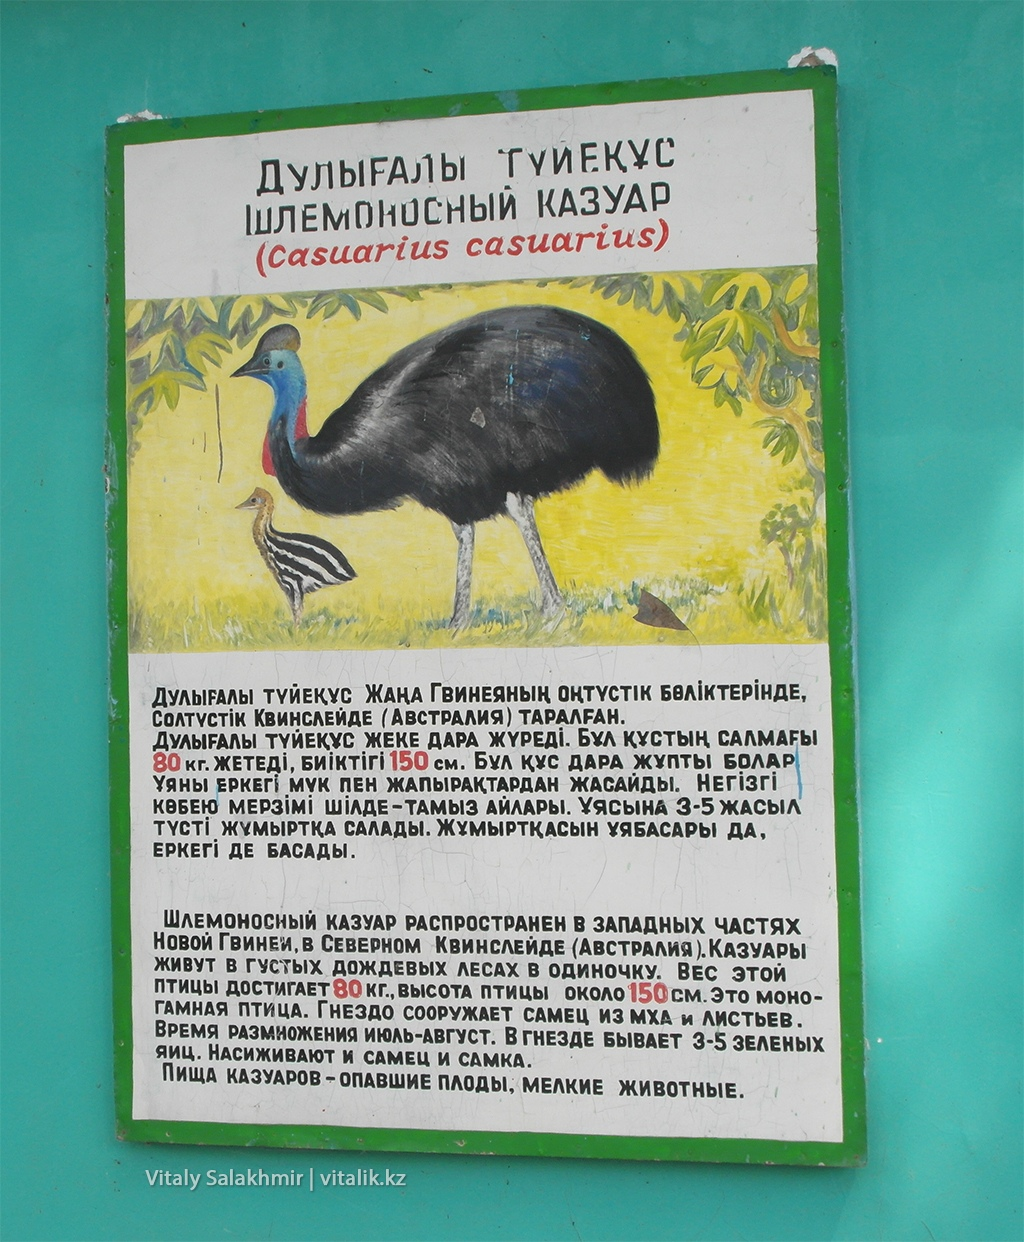 Шлемоносный казуар, табличка на клетке, зоопарк Алматы 2018